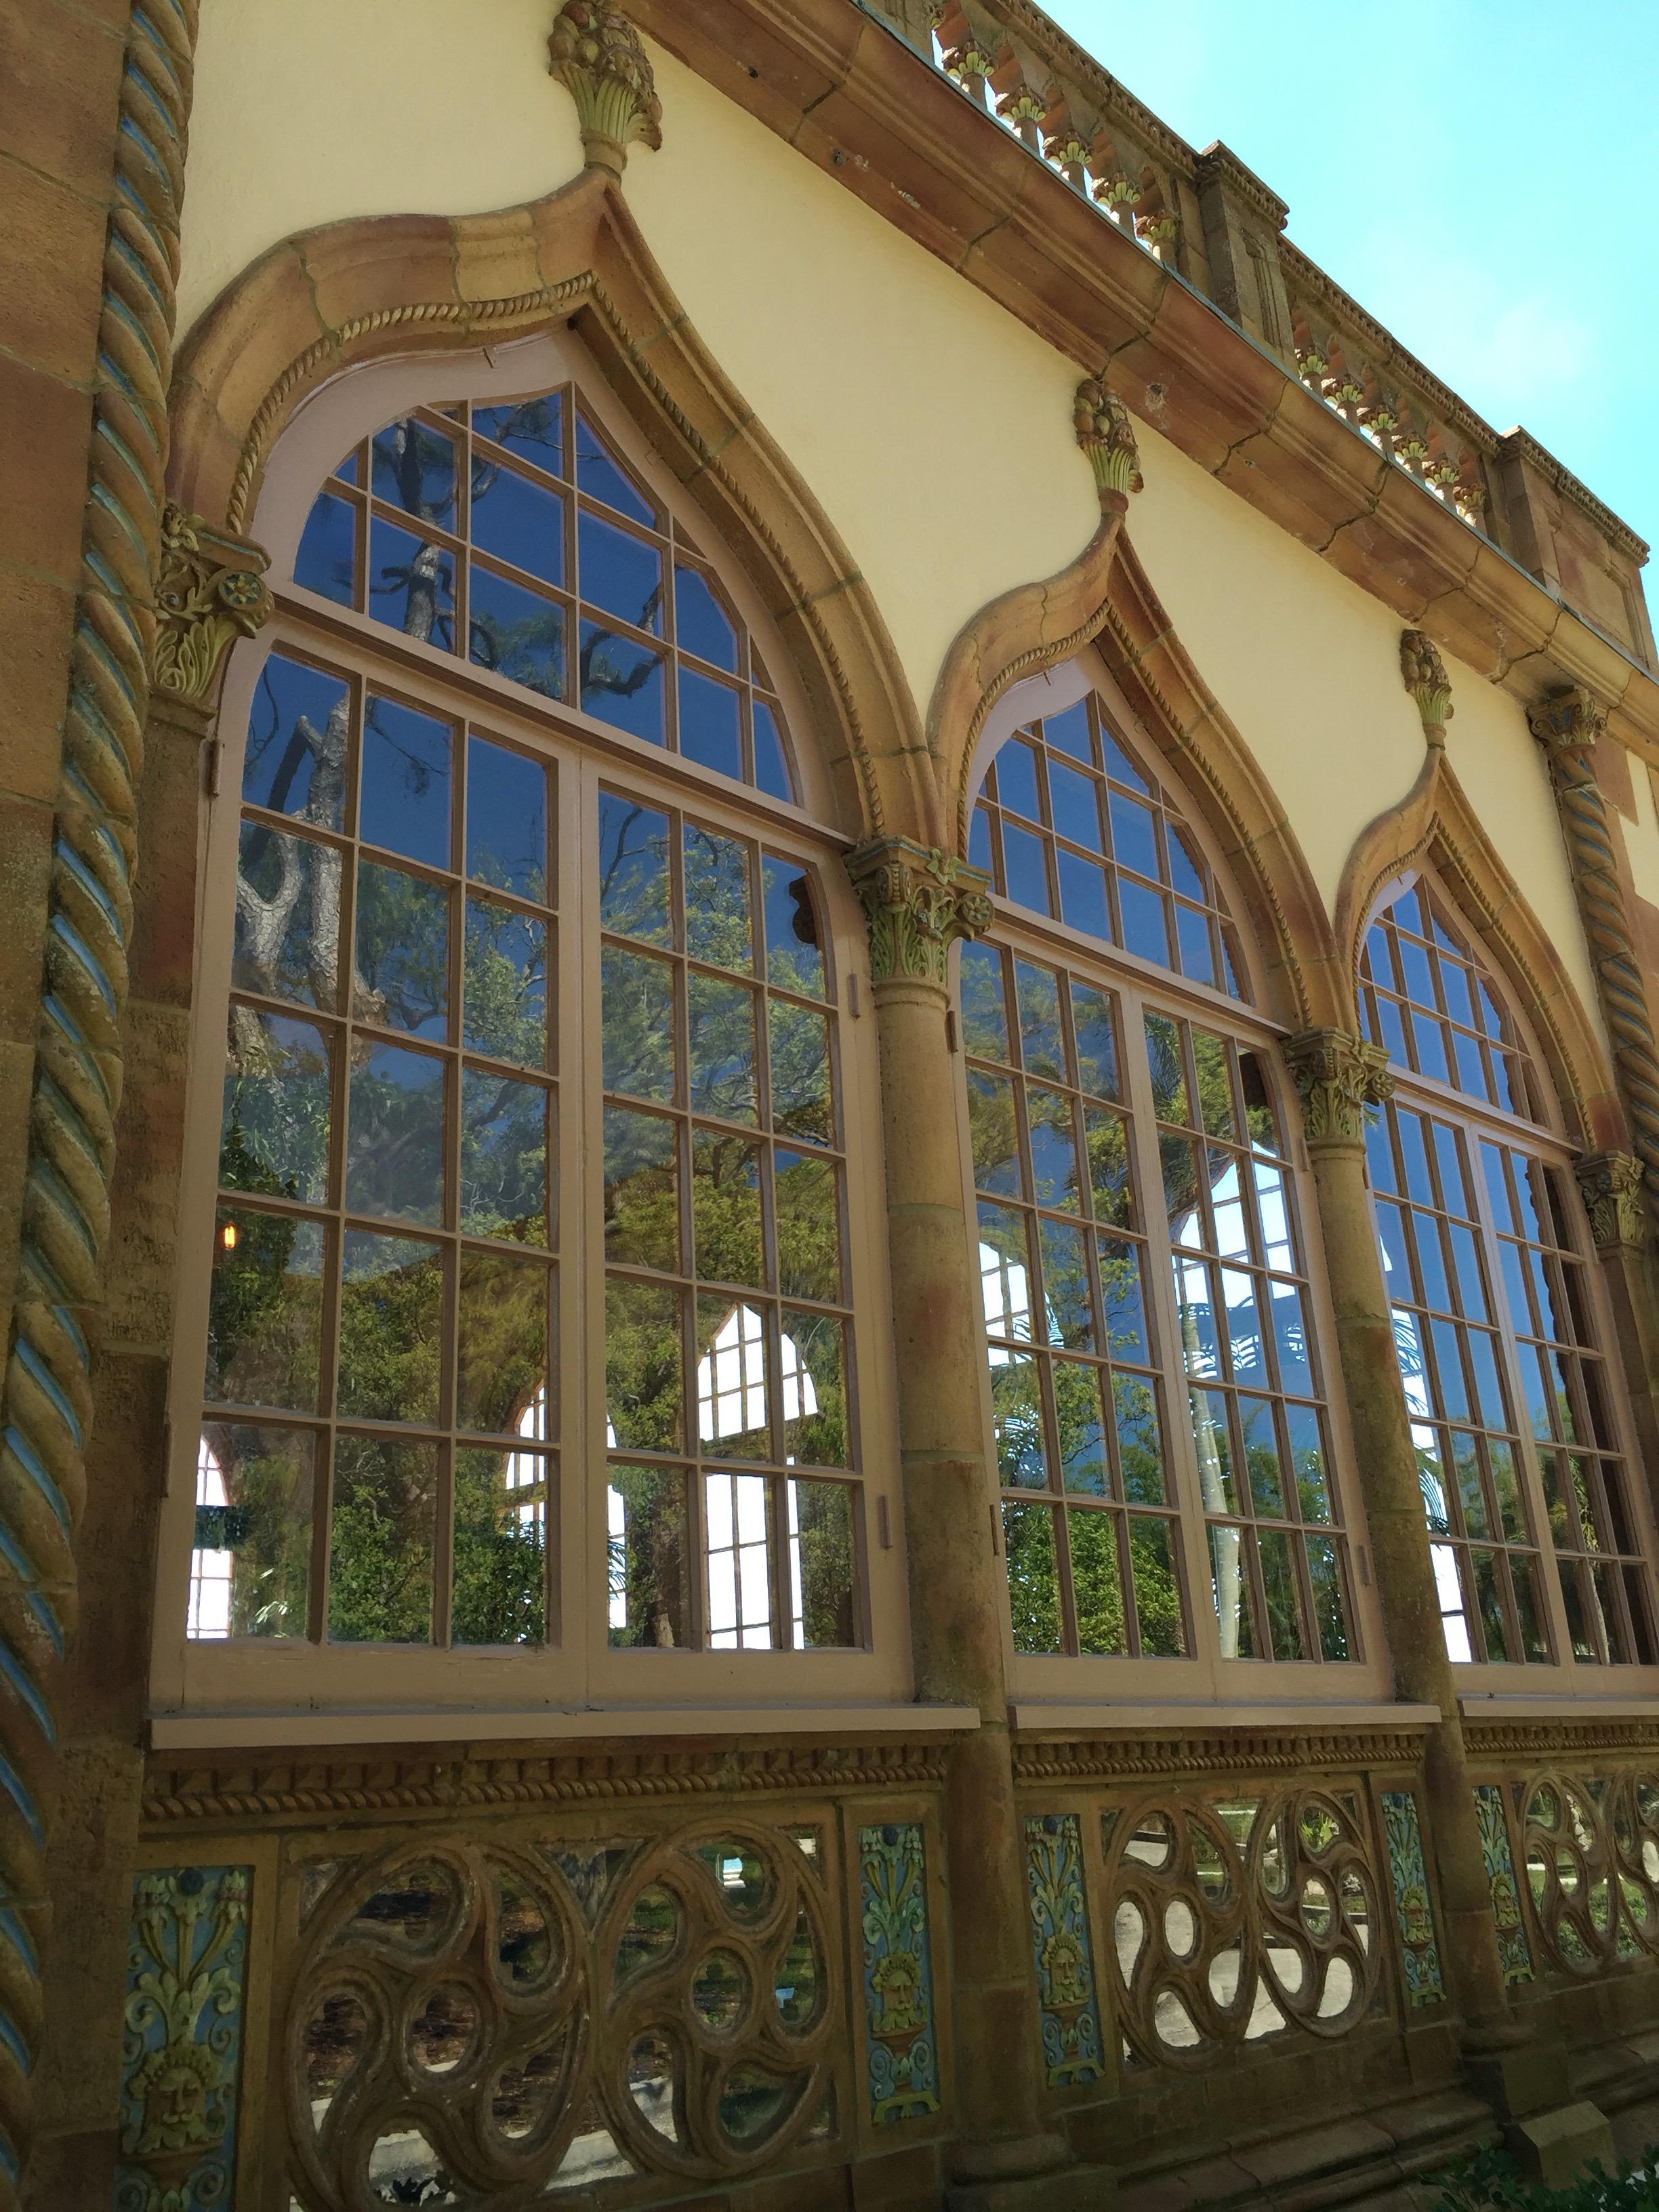 Ca' D' Zan, John Ringling, Ringling Estate, Sarasota, Ringling Circus, Windows